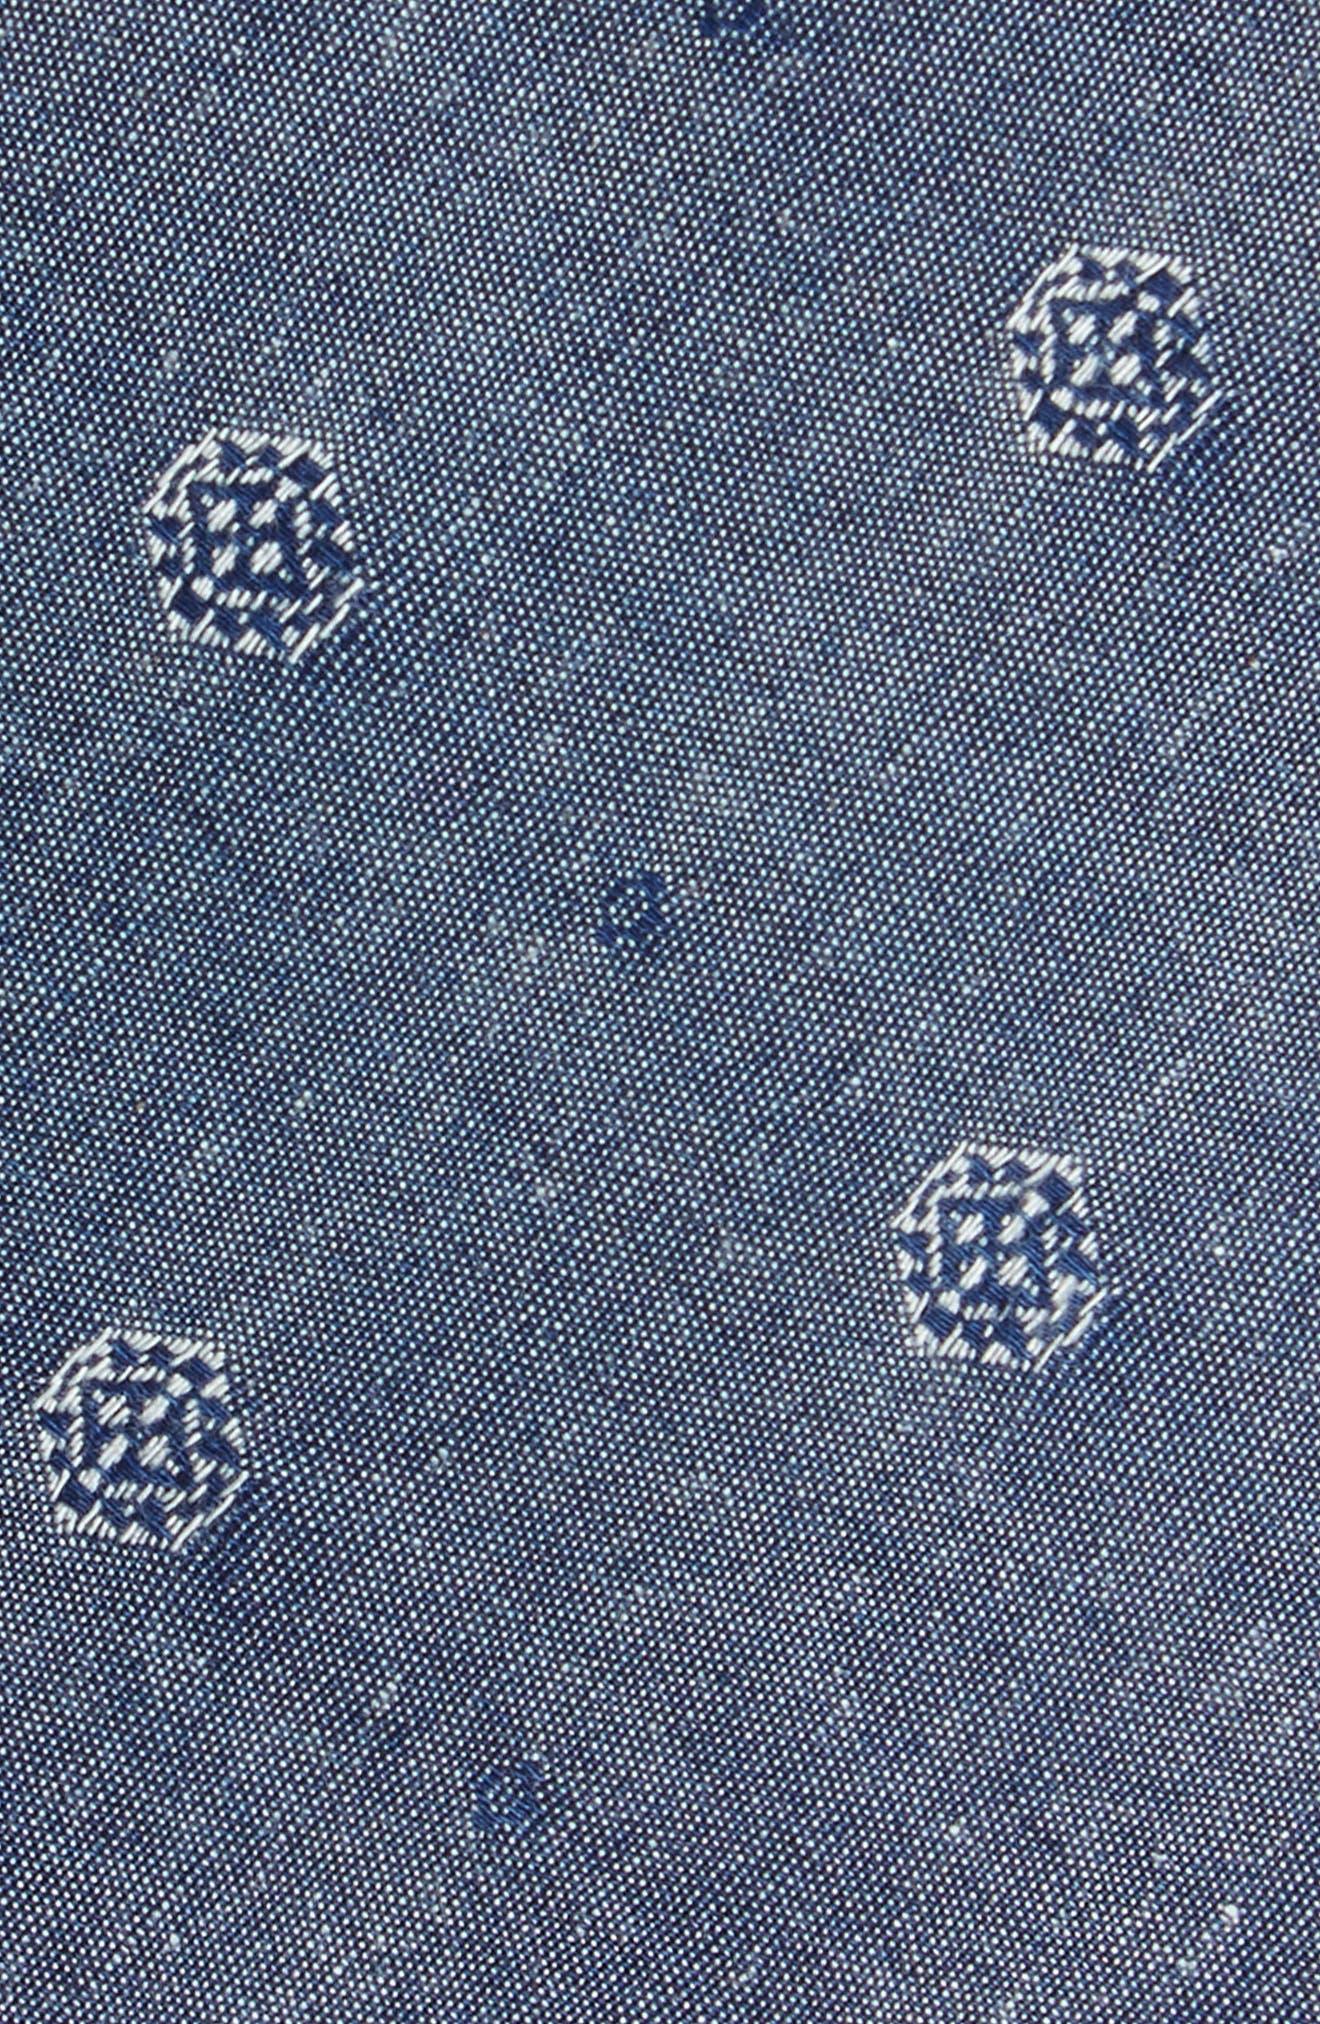 Alternate Image 2  - Nordstrom Men's Shop Medallion Cotton Tie